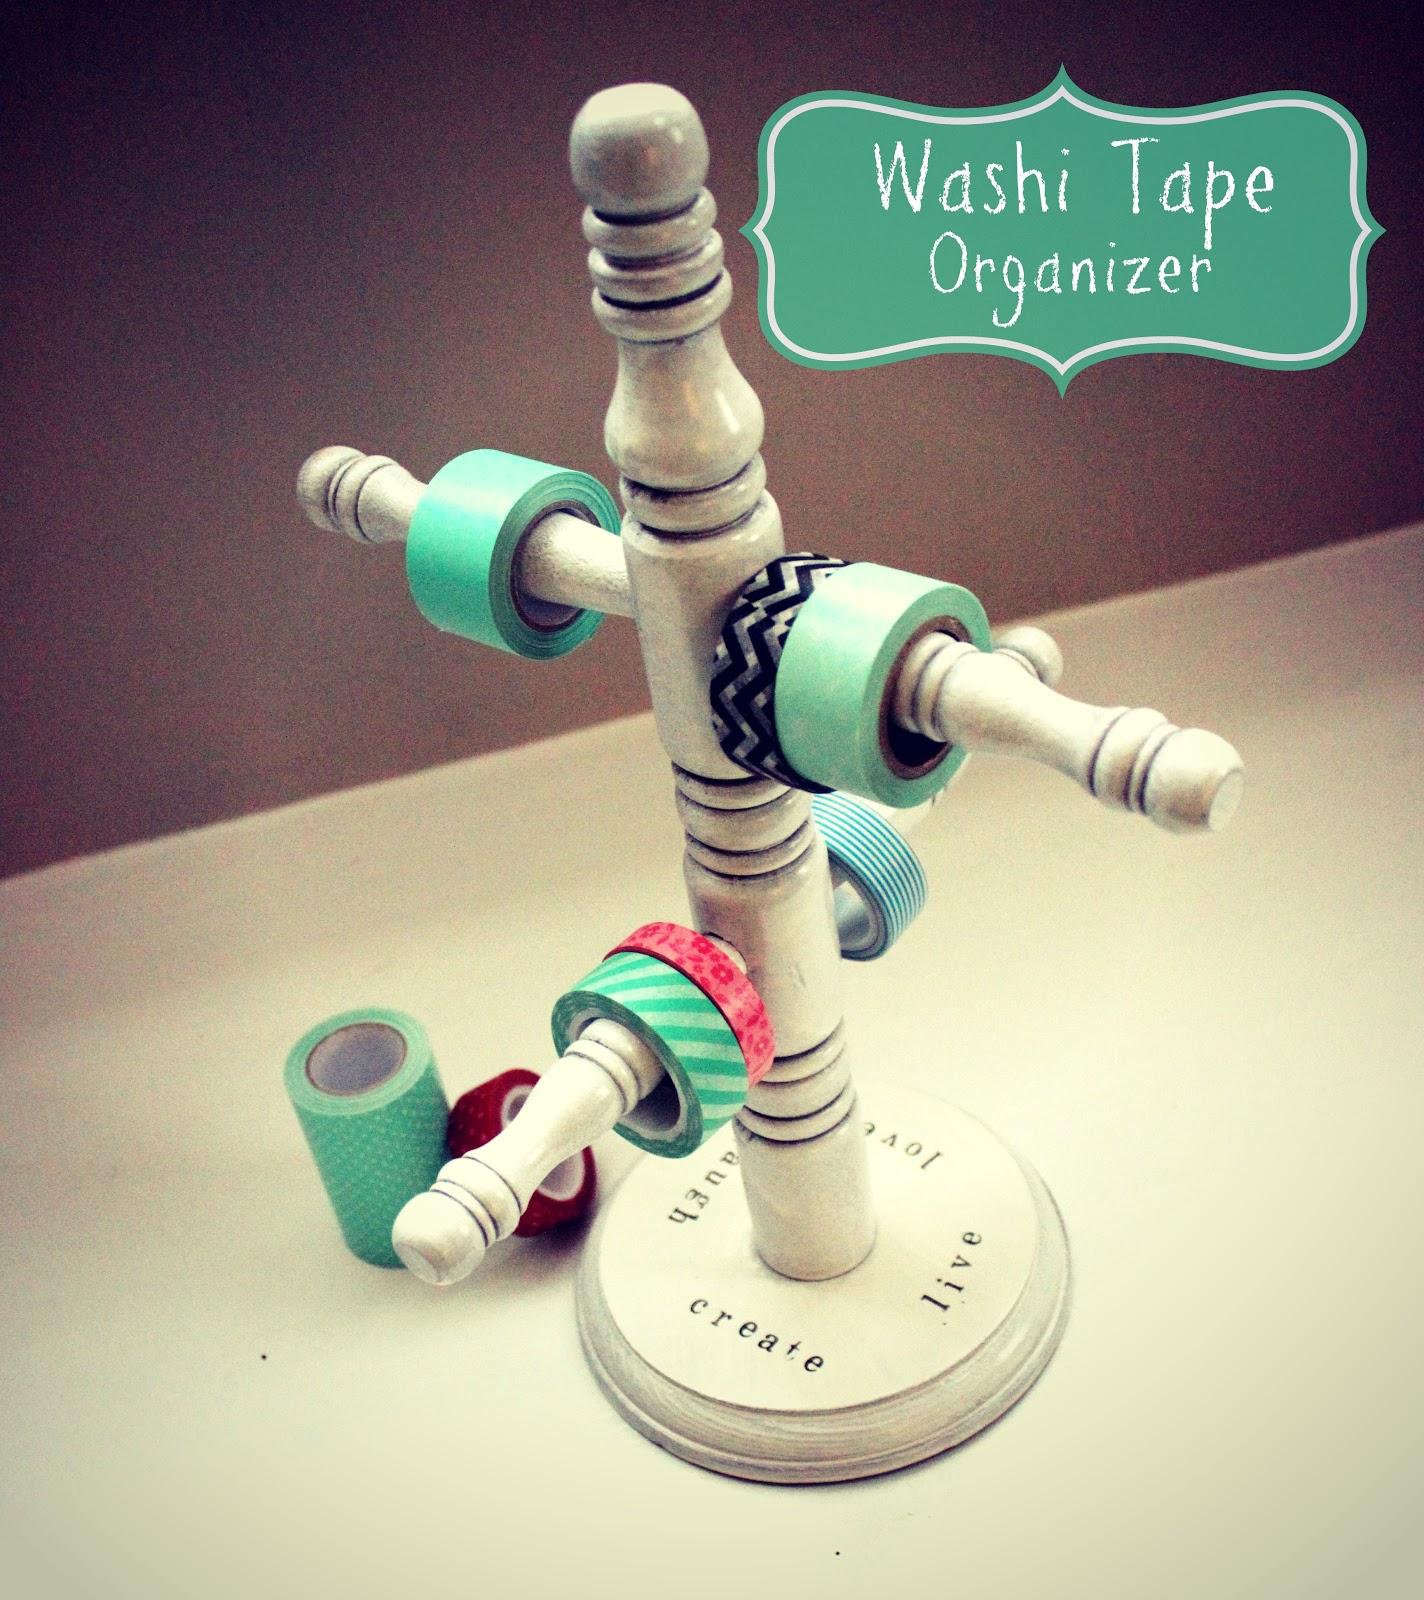 washi-tape-organizer